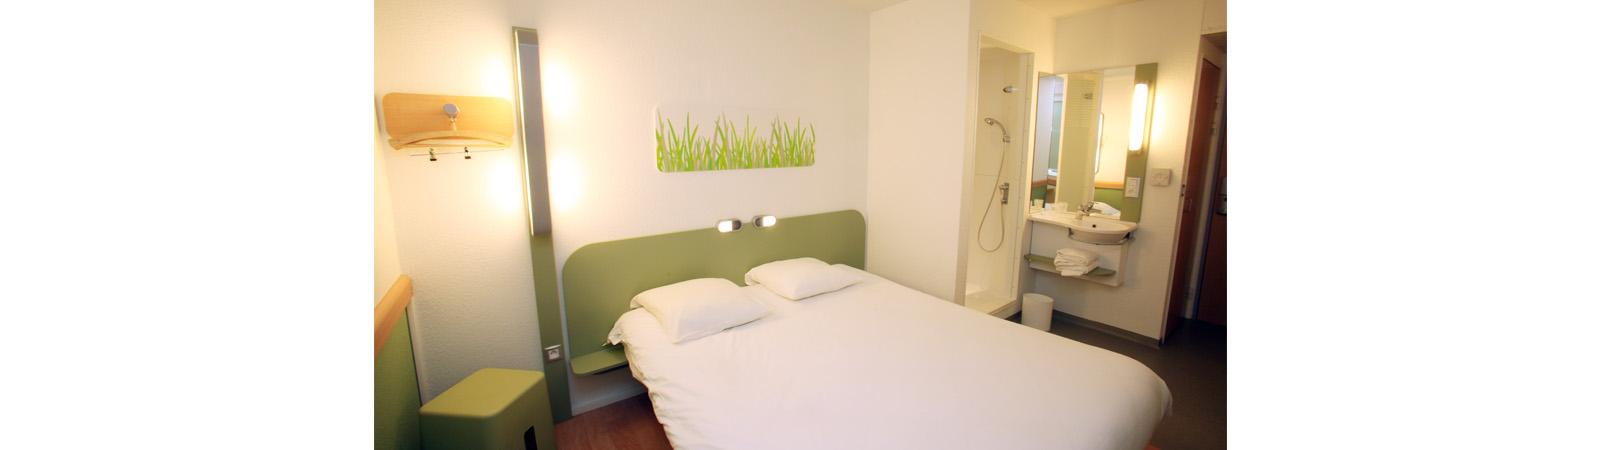 Hotel-Ibis-budget-reze_0001_10